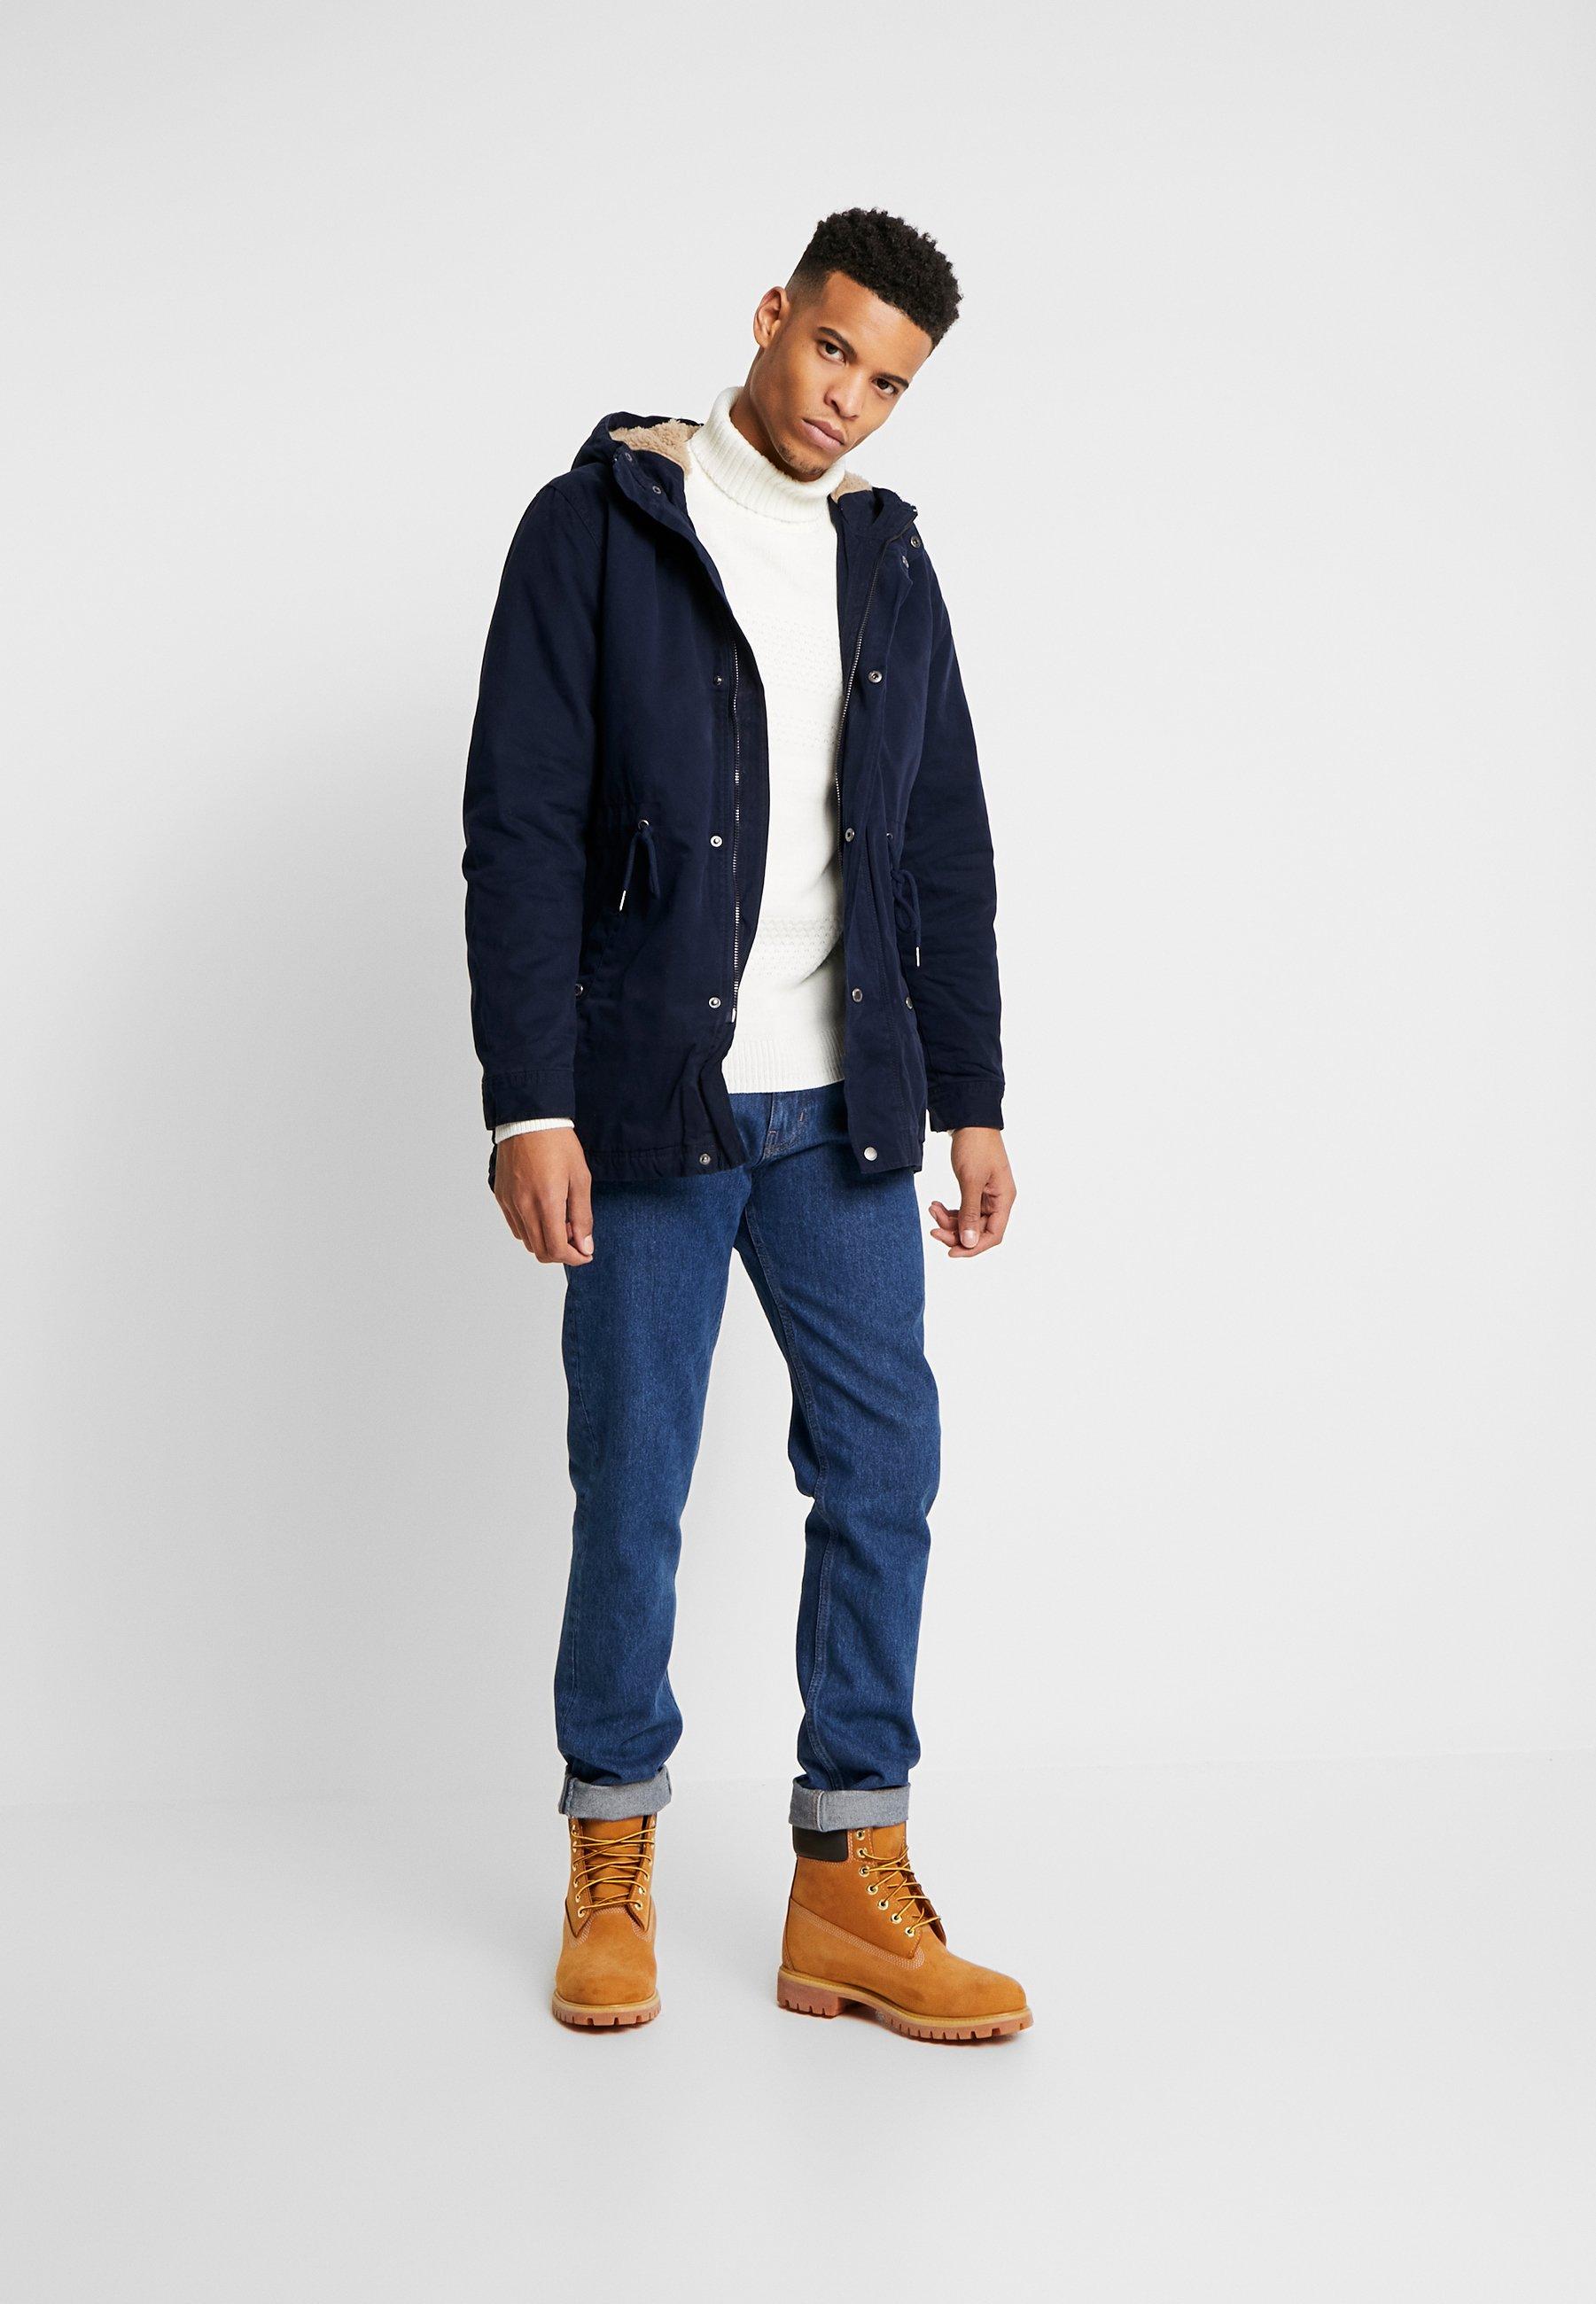 Cotton On Military Jacket - Parka Navy